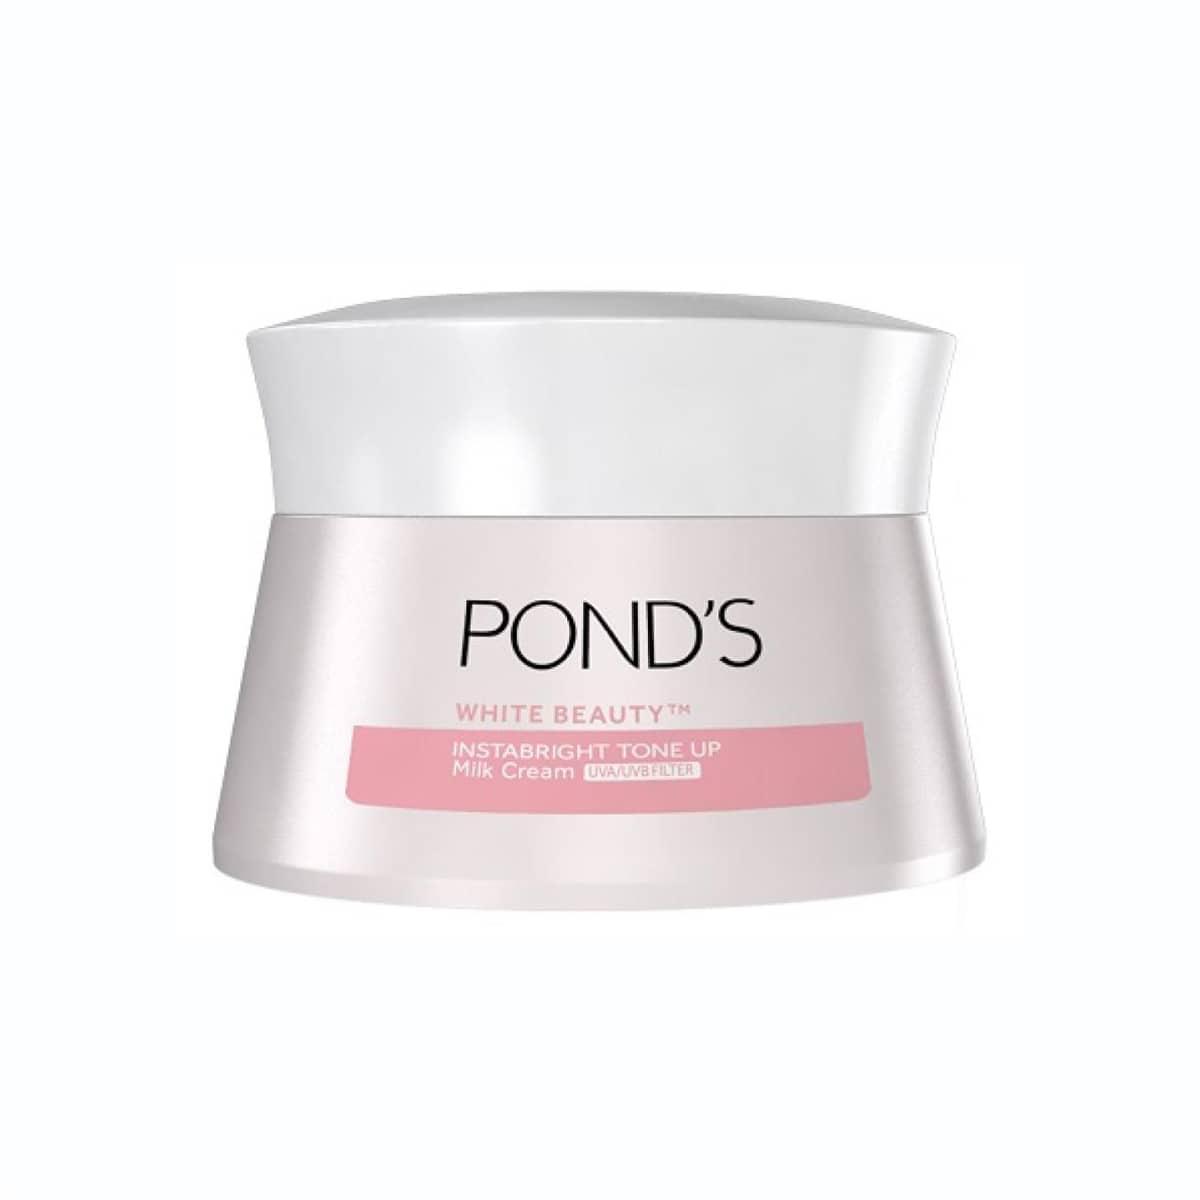 Pond's Instabright Tone Up Cream 35g